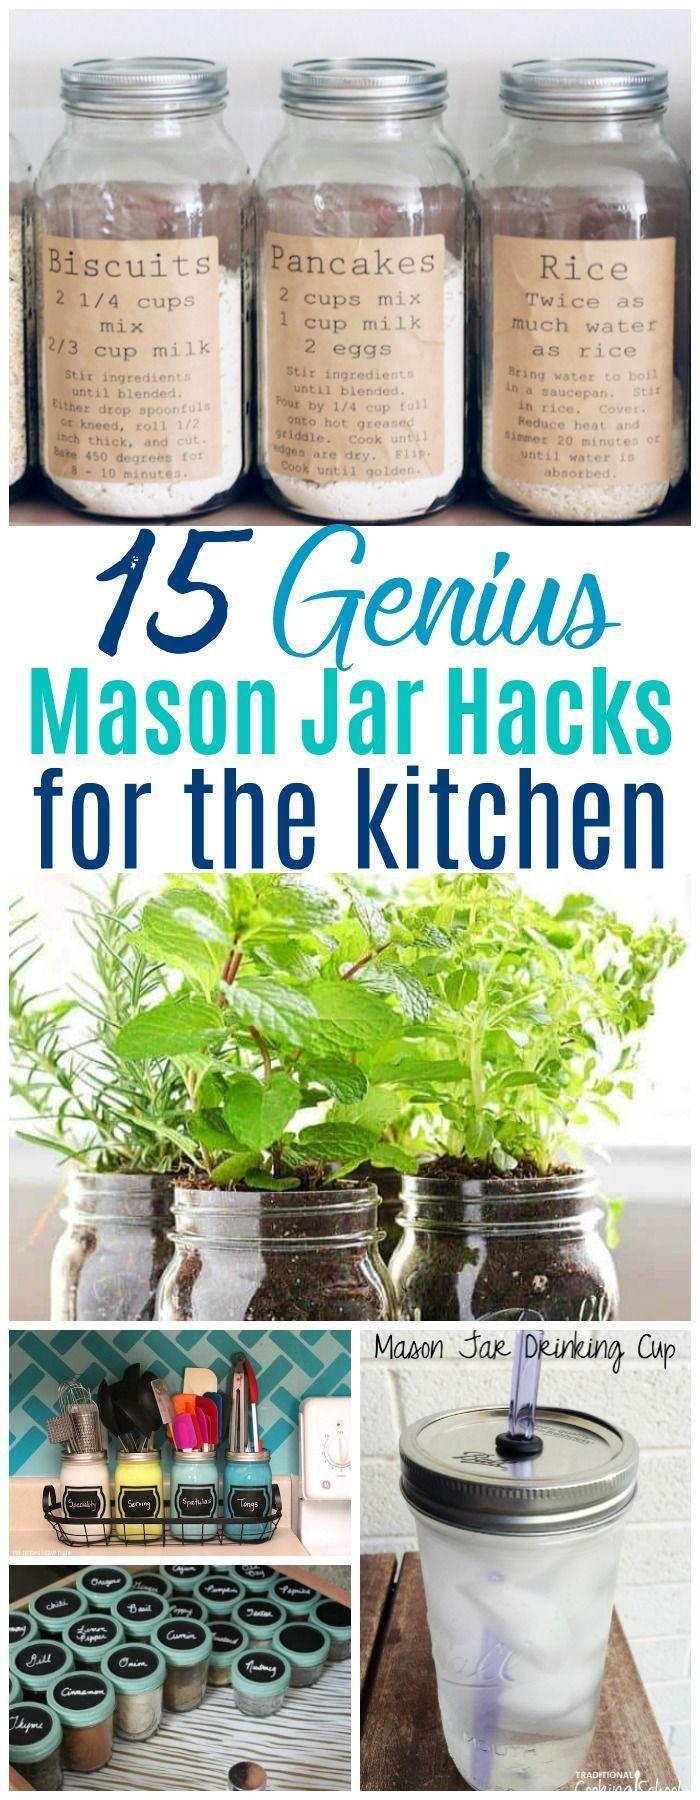 15 Creative Mason Jar Kitchen Storage Ideas #masonjardiy